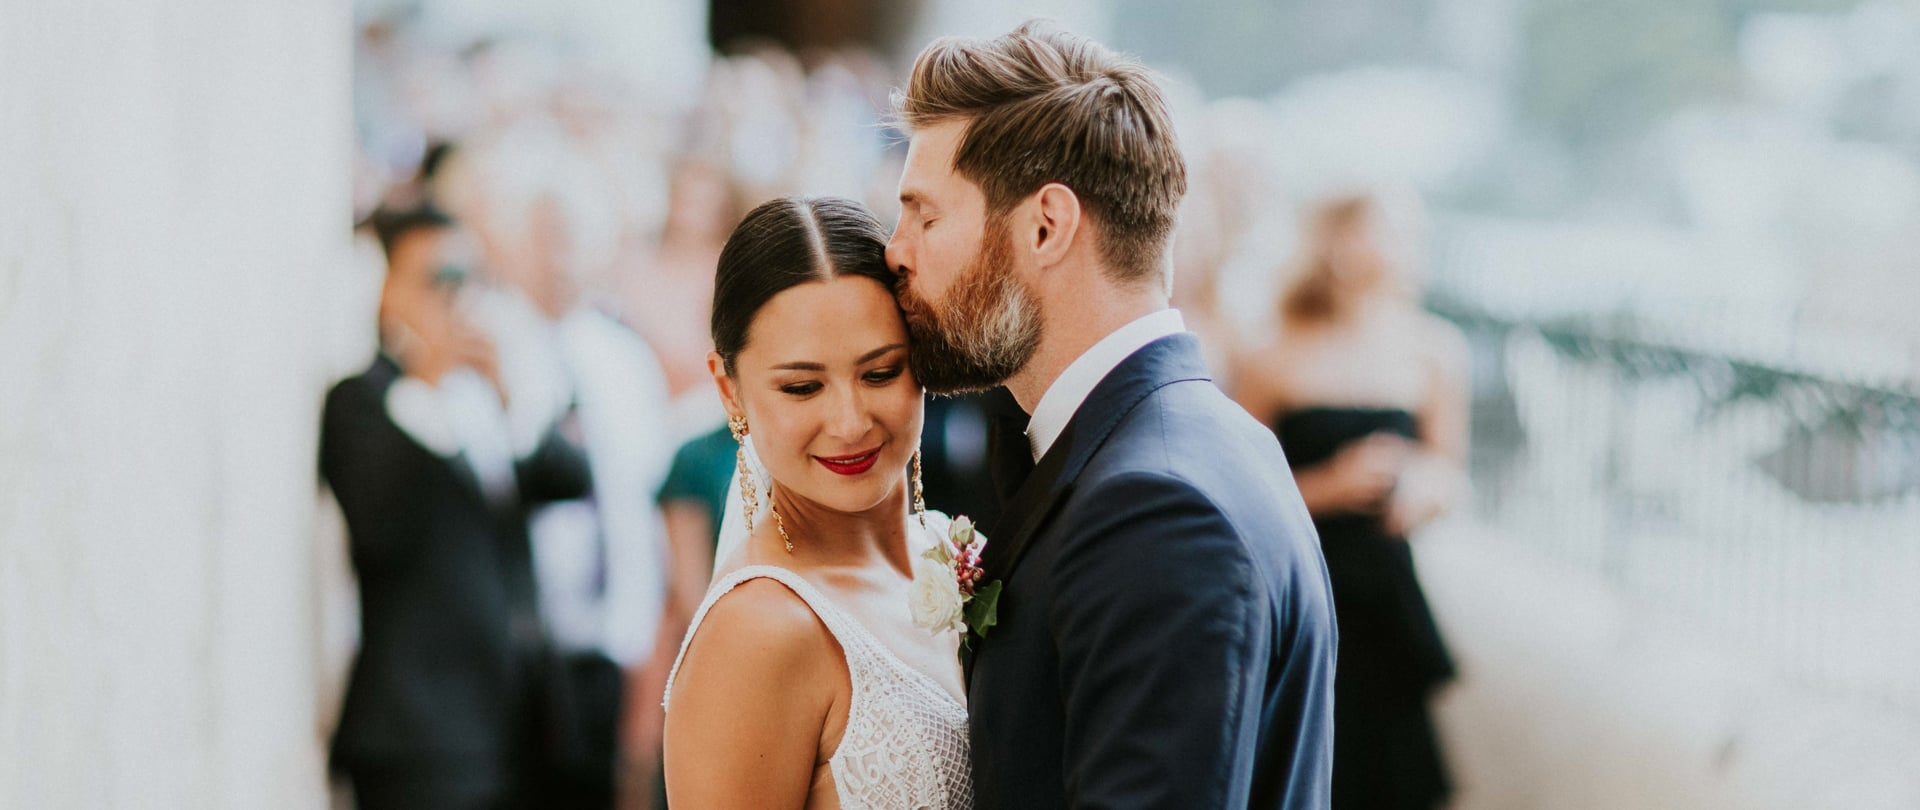 Monica & Stephen Wedding Video Filmed at Capri, Italy